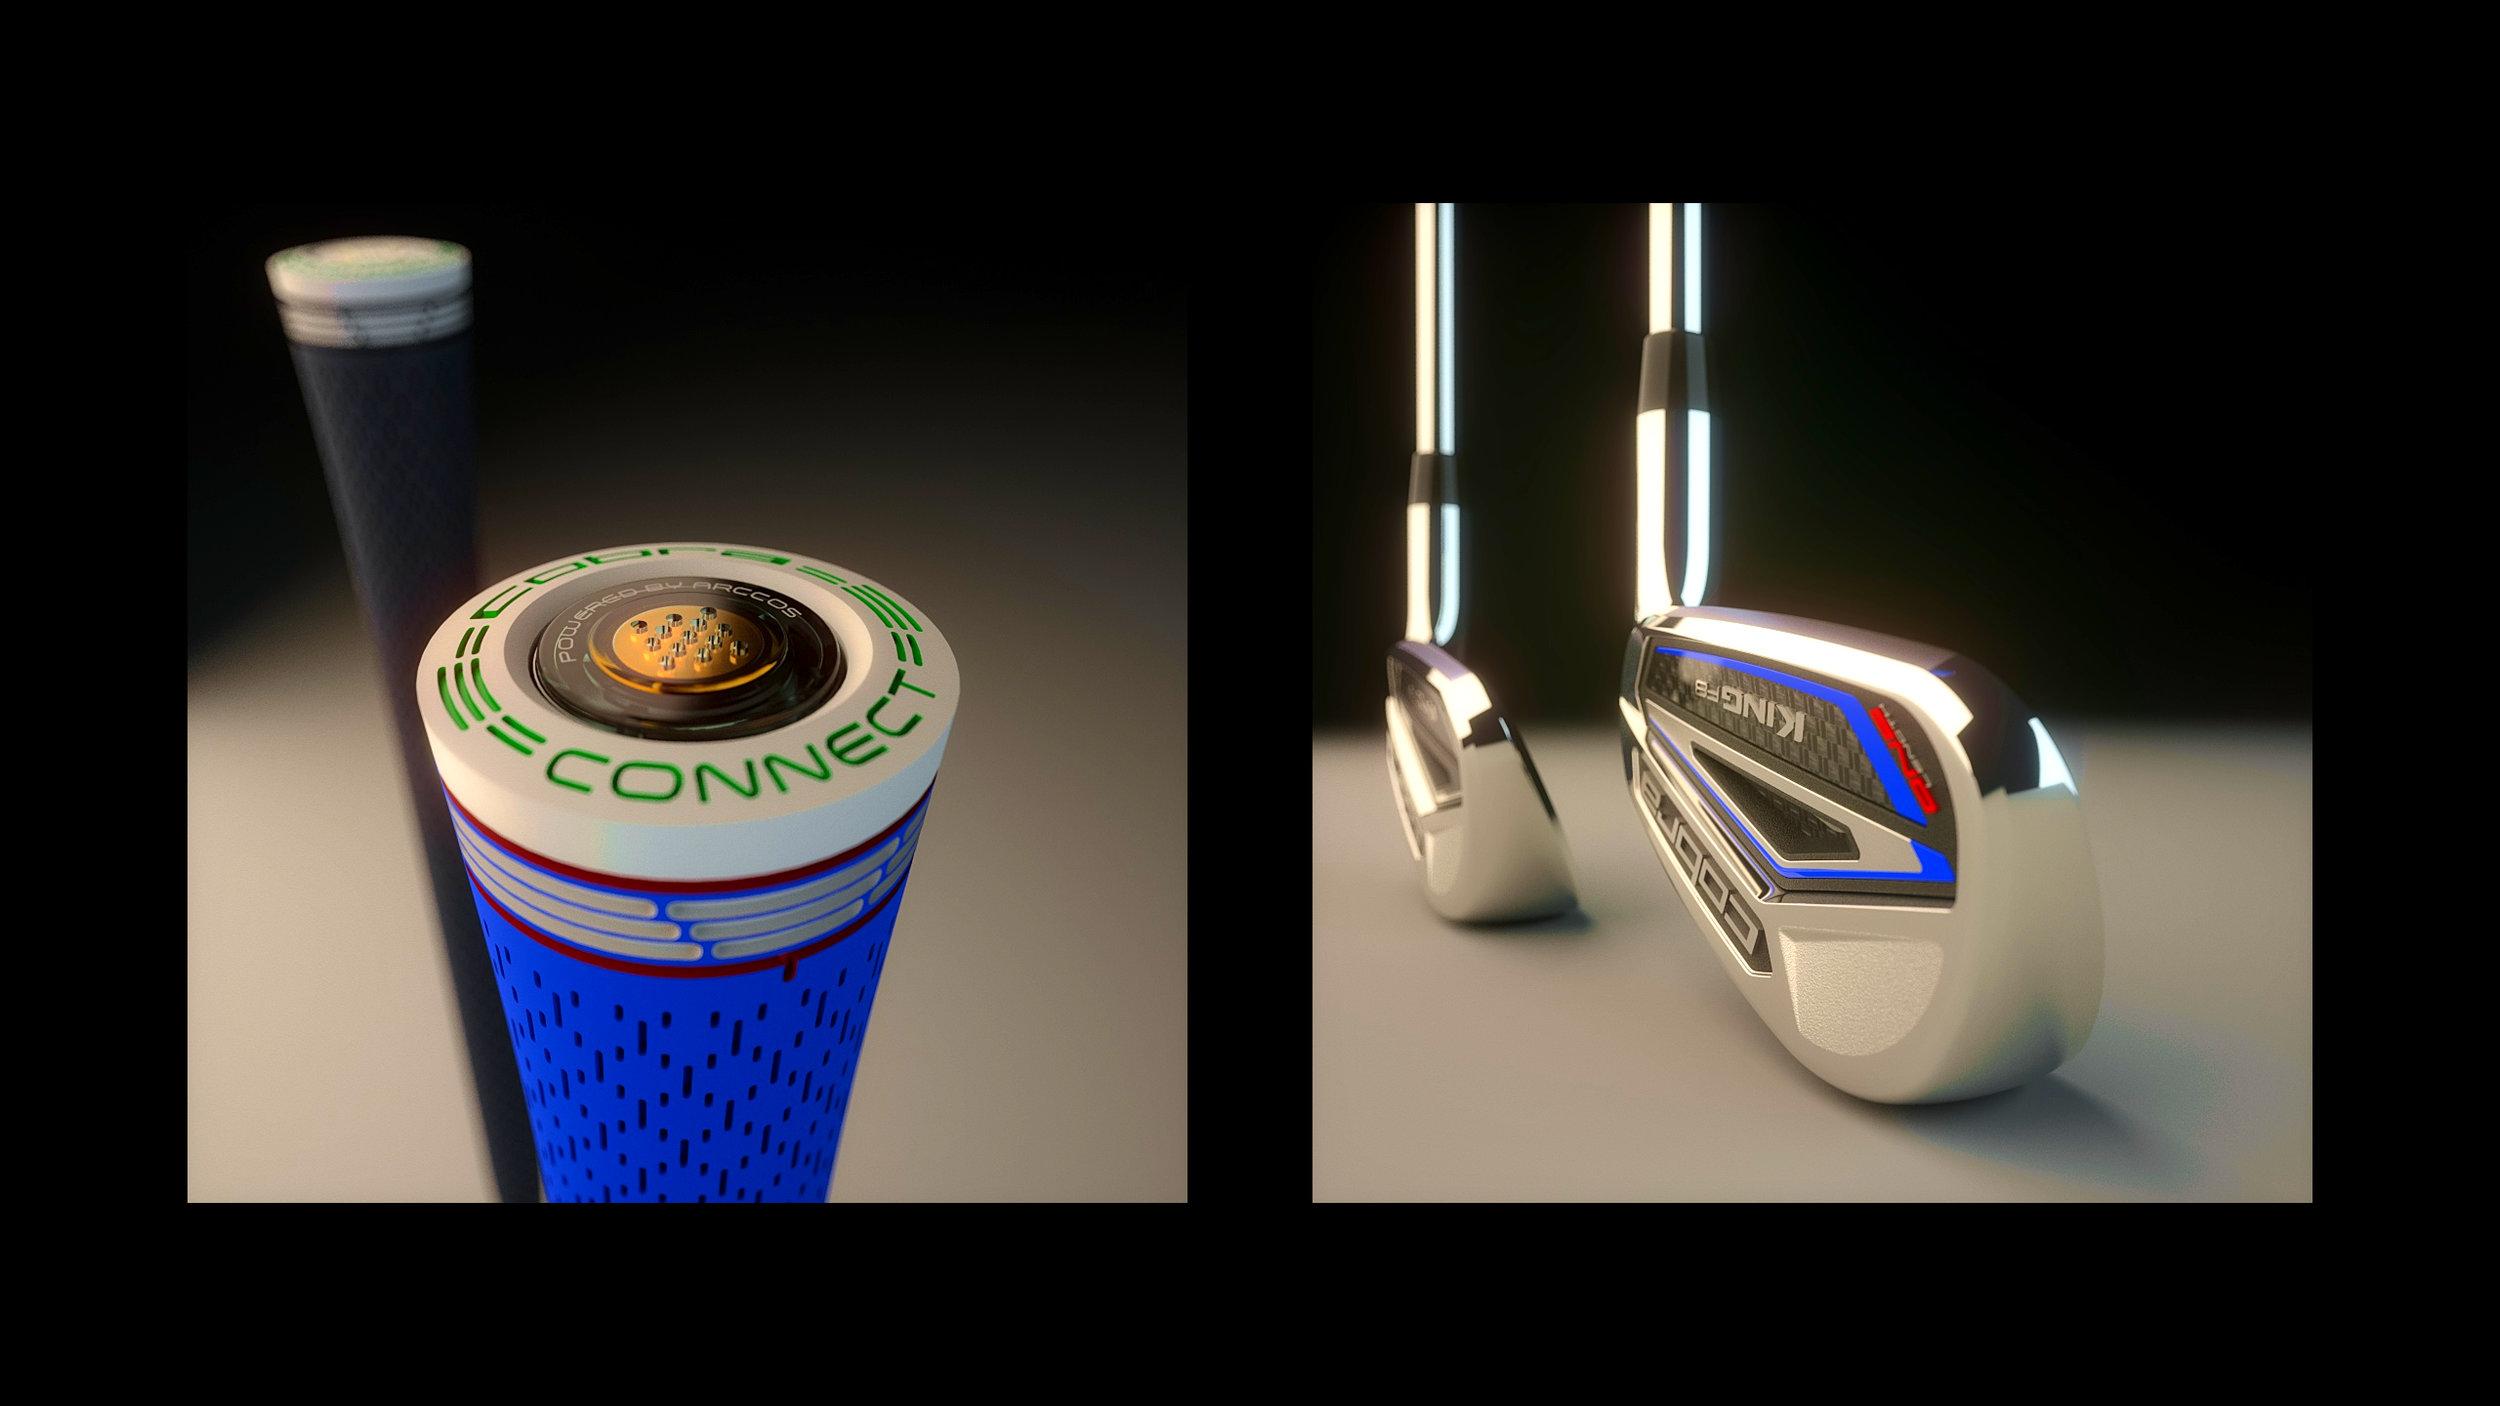 Cobra+Golf+Web+c.jpg